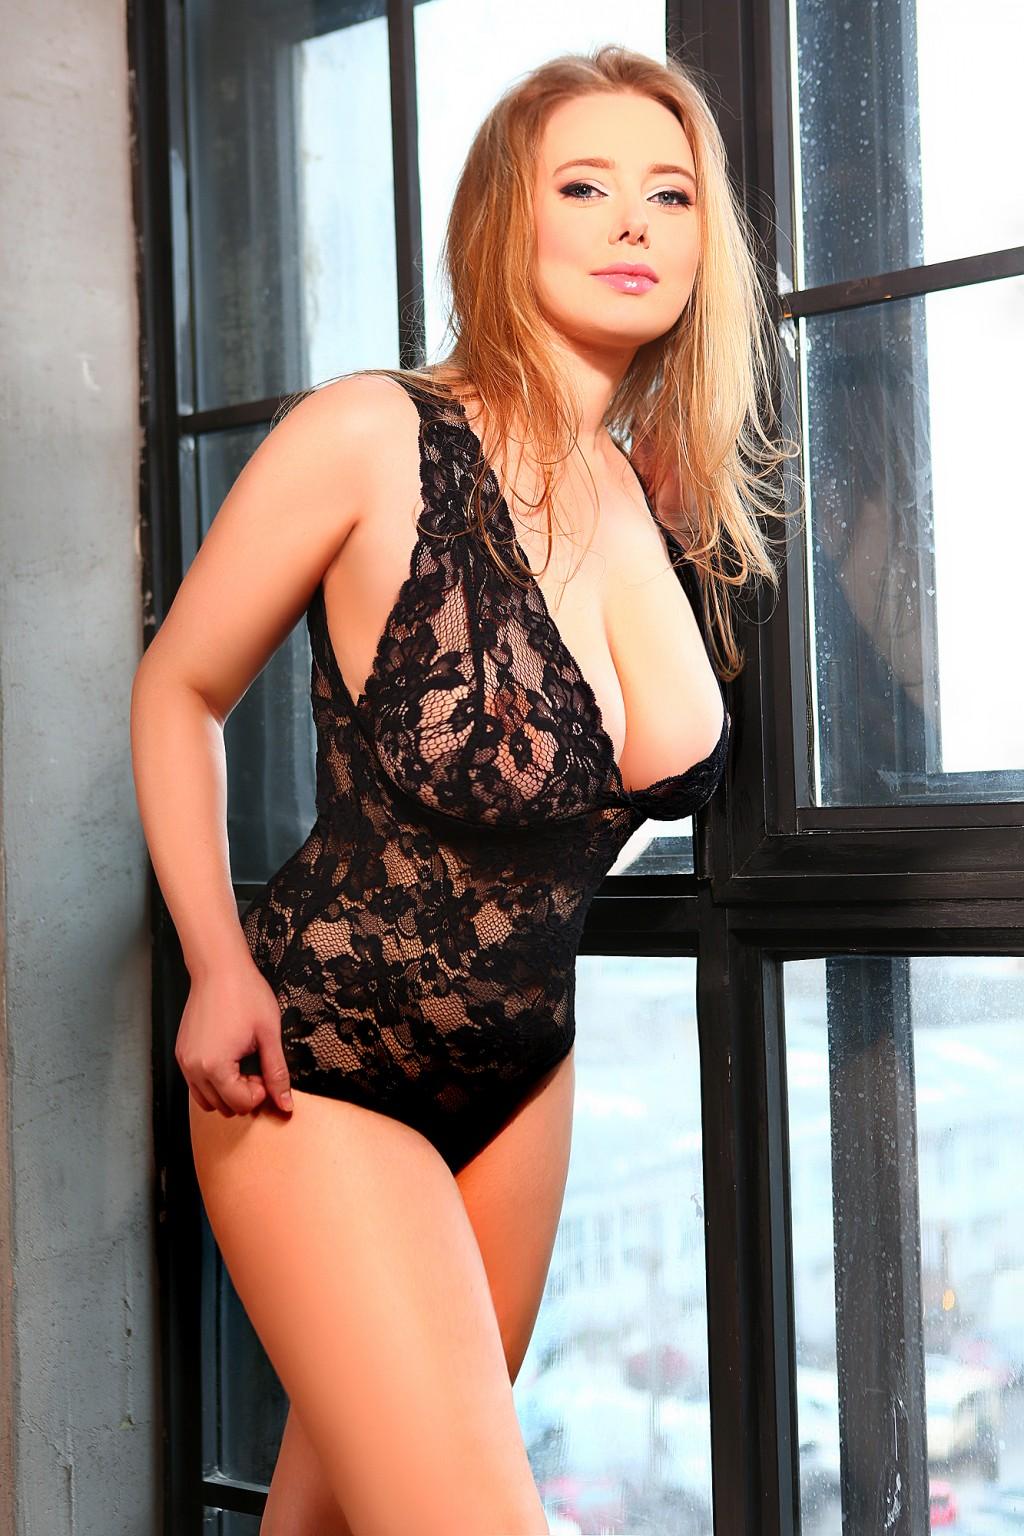 Claudia-Constanze, sex i Marstrand - 2354